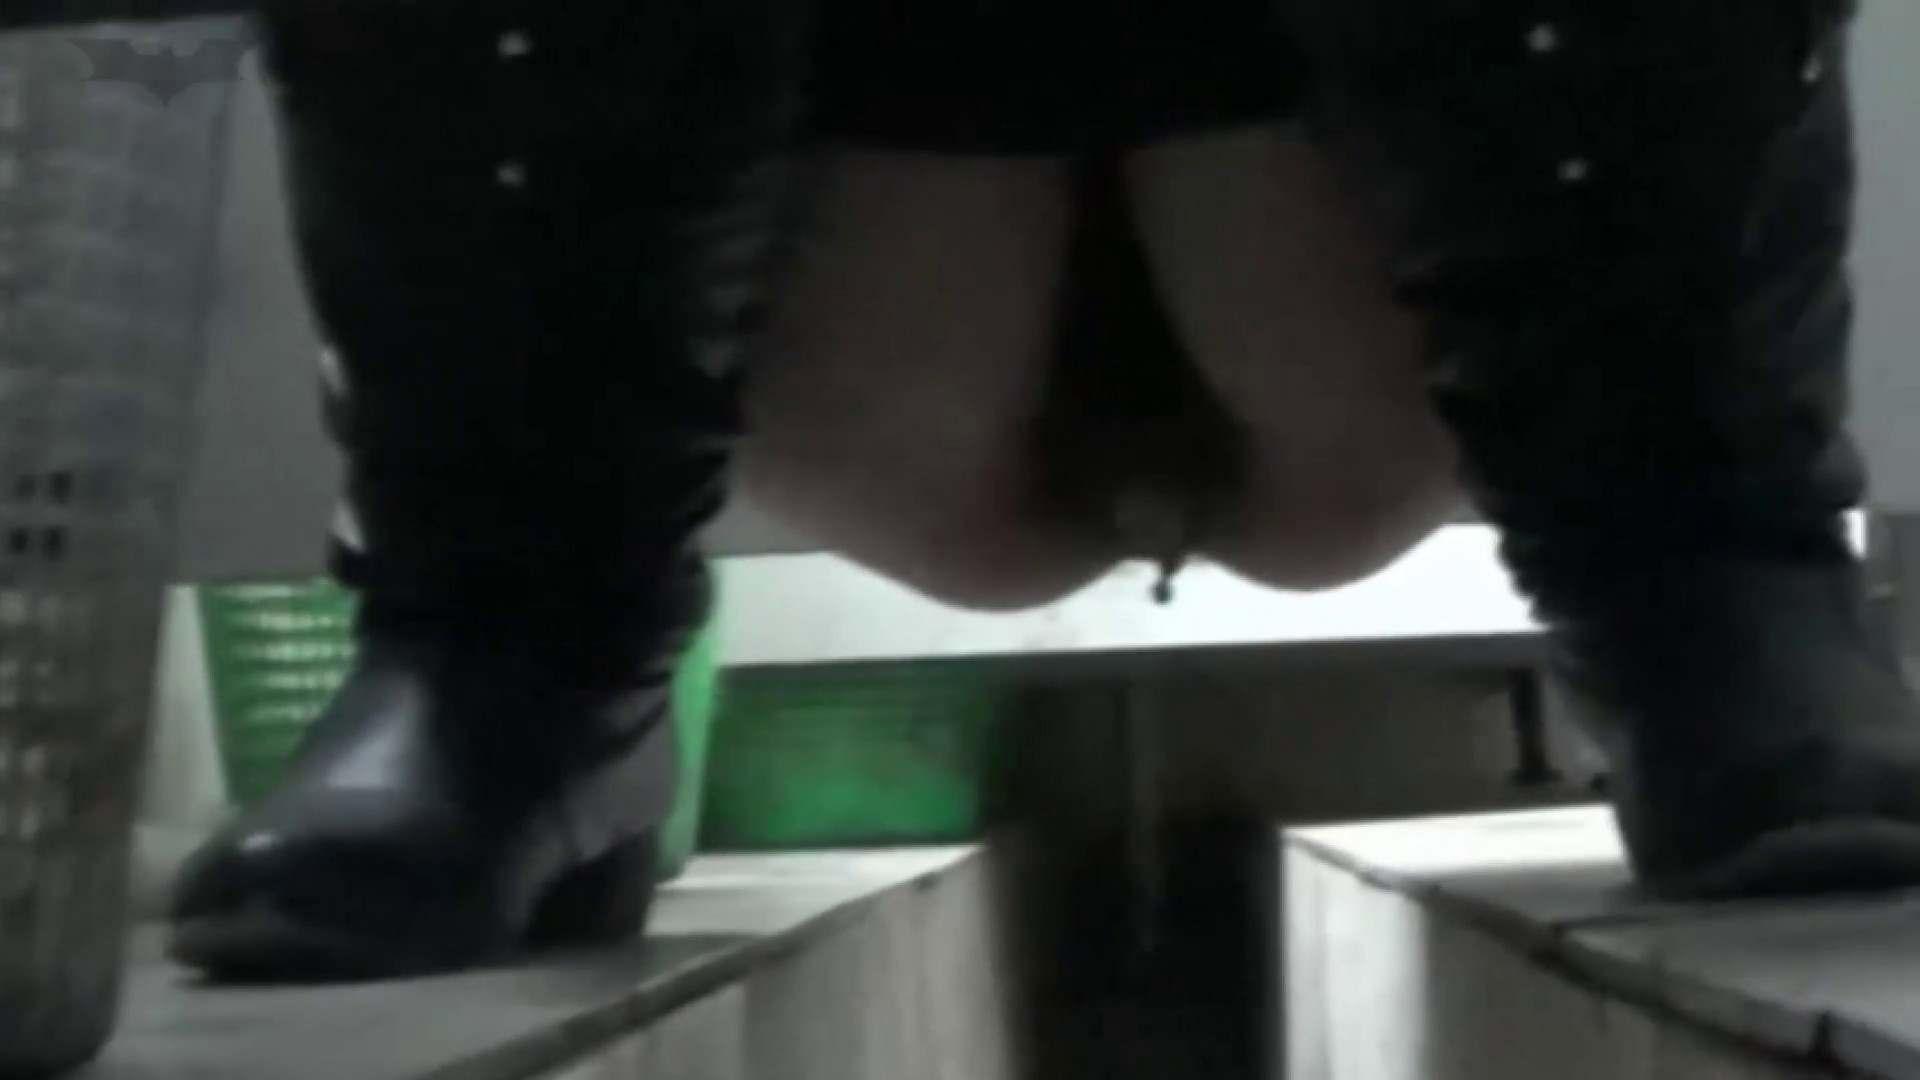 JD盗撮 美女の洗面所の秘密 Vol.29 美女 隠し撮りAV無料 92pic 88